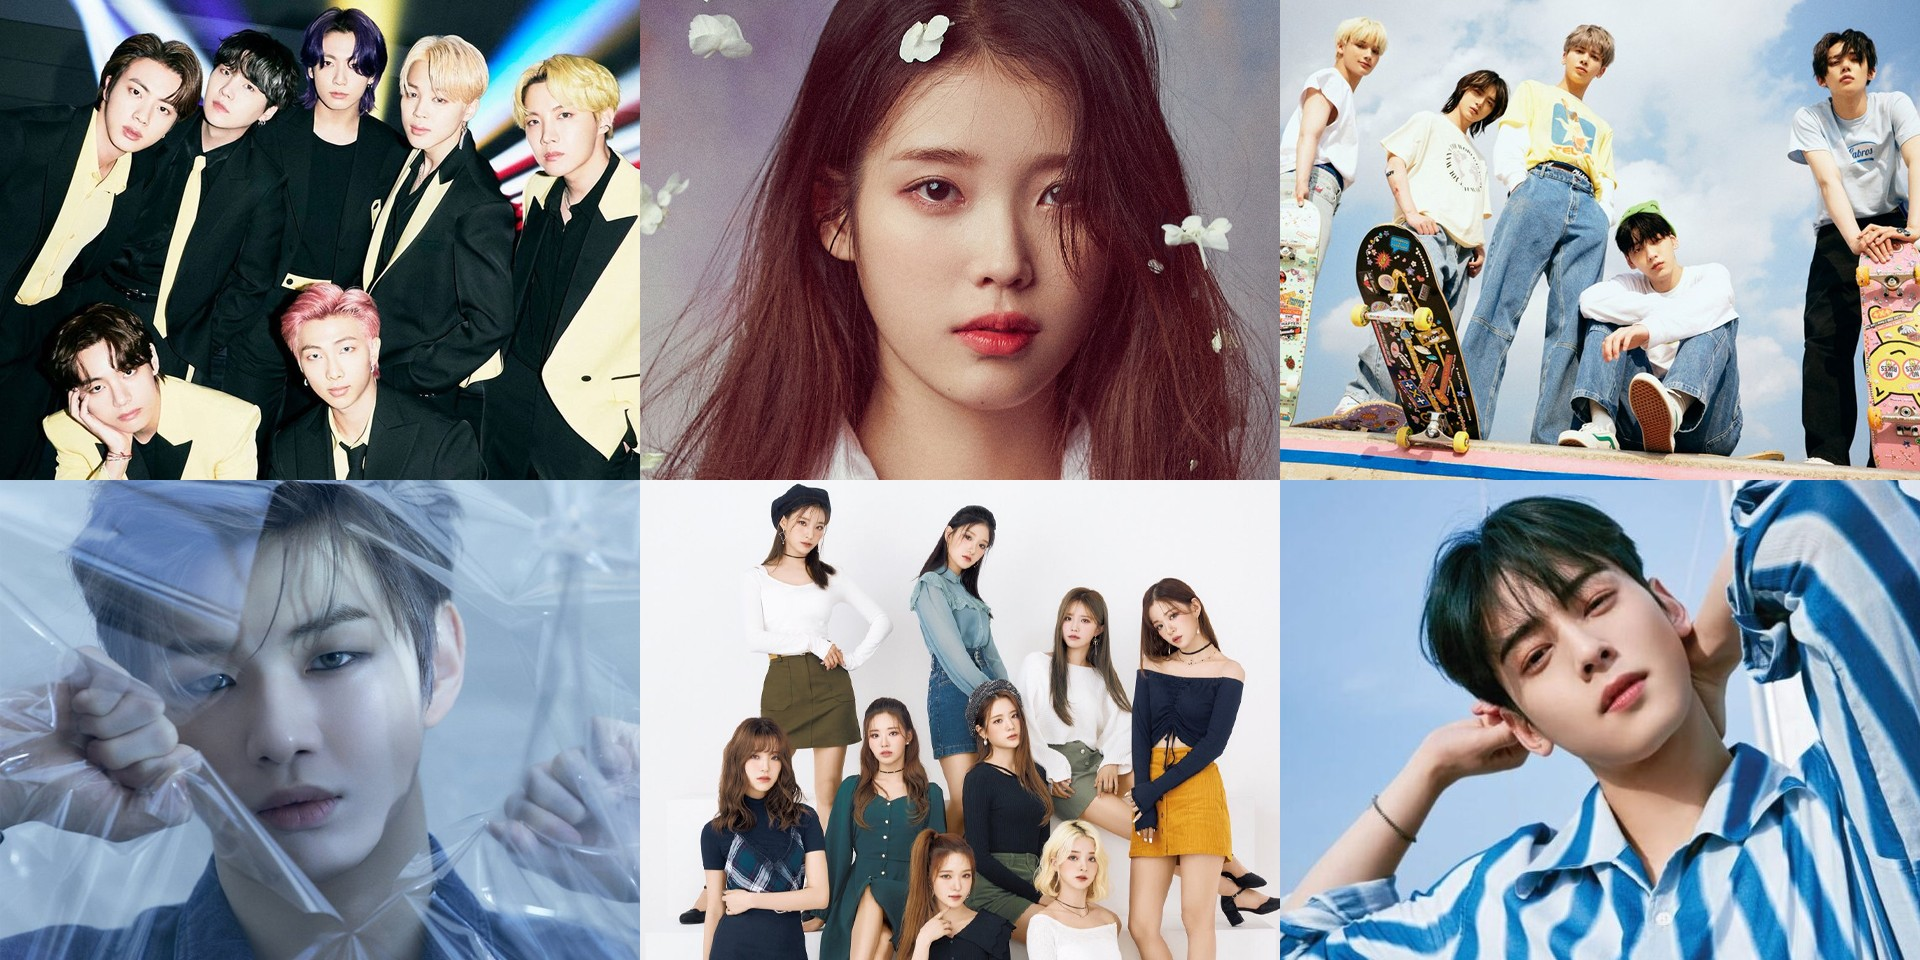 BTS, IU, Kang Daniel, fromis_9, Cha Eun-woo, TXT, and more win at the 2021 Brand of the Year Awards